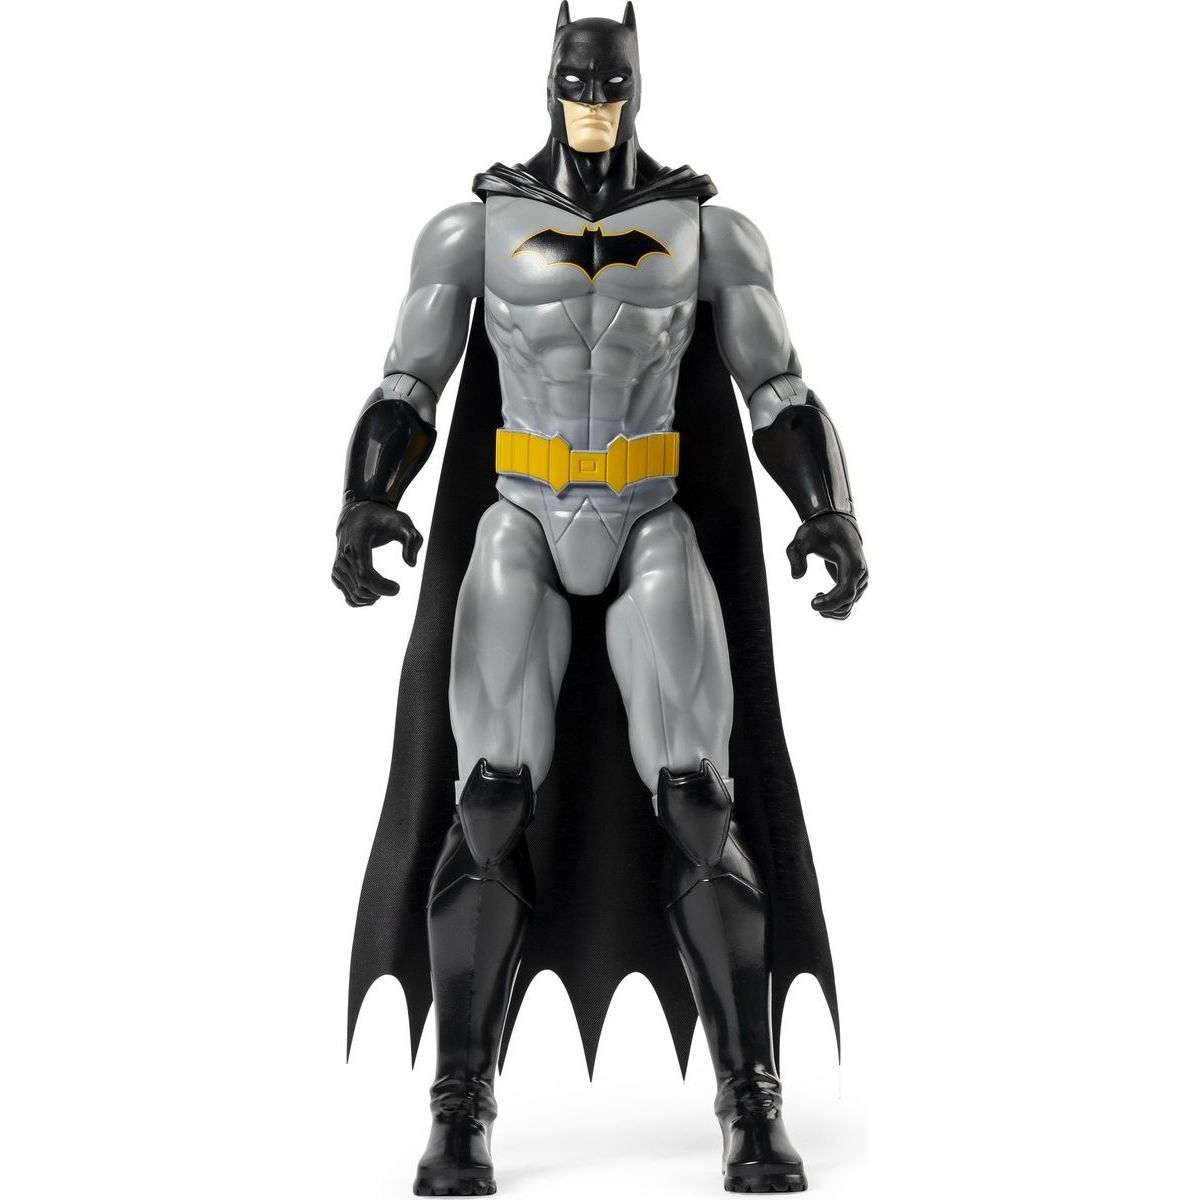 Spin Master Batman figurka 30 cm solid černý oblek